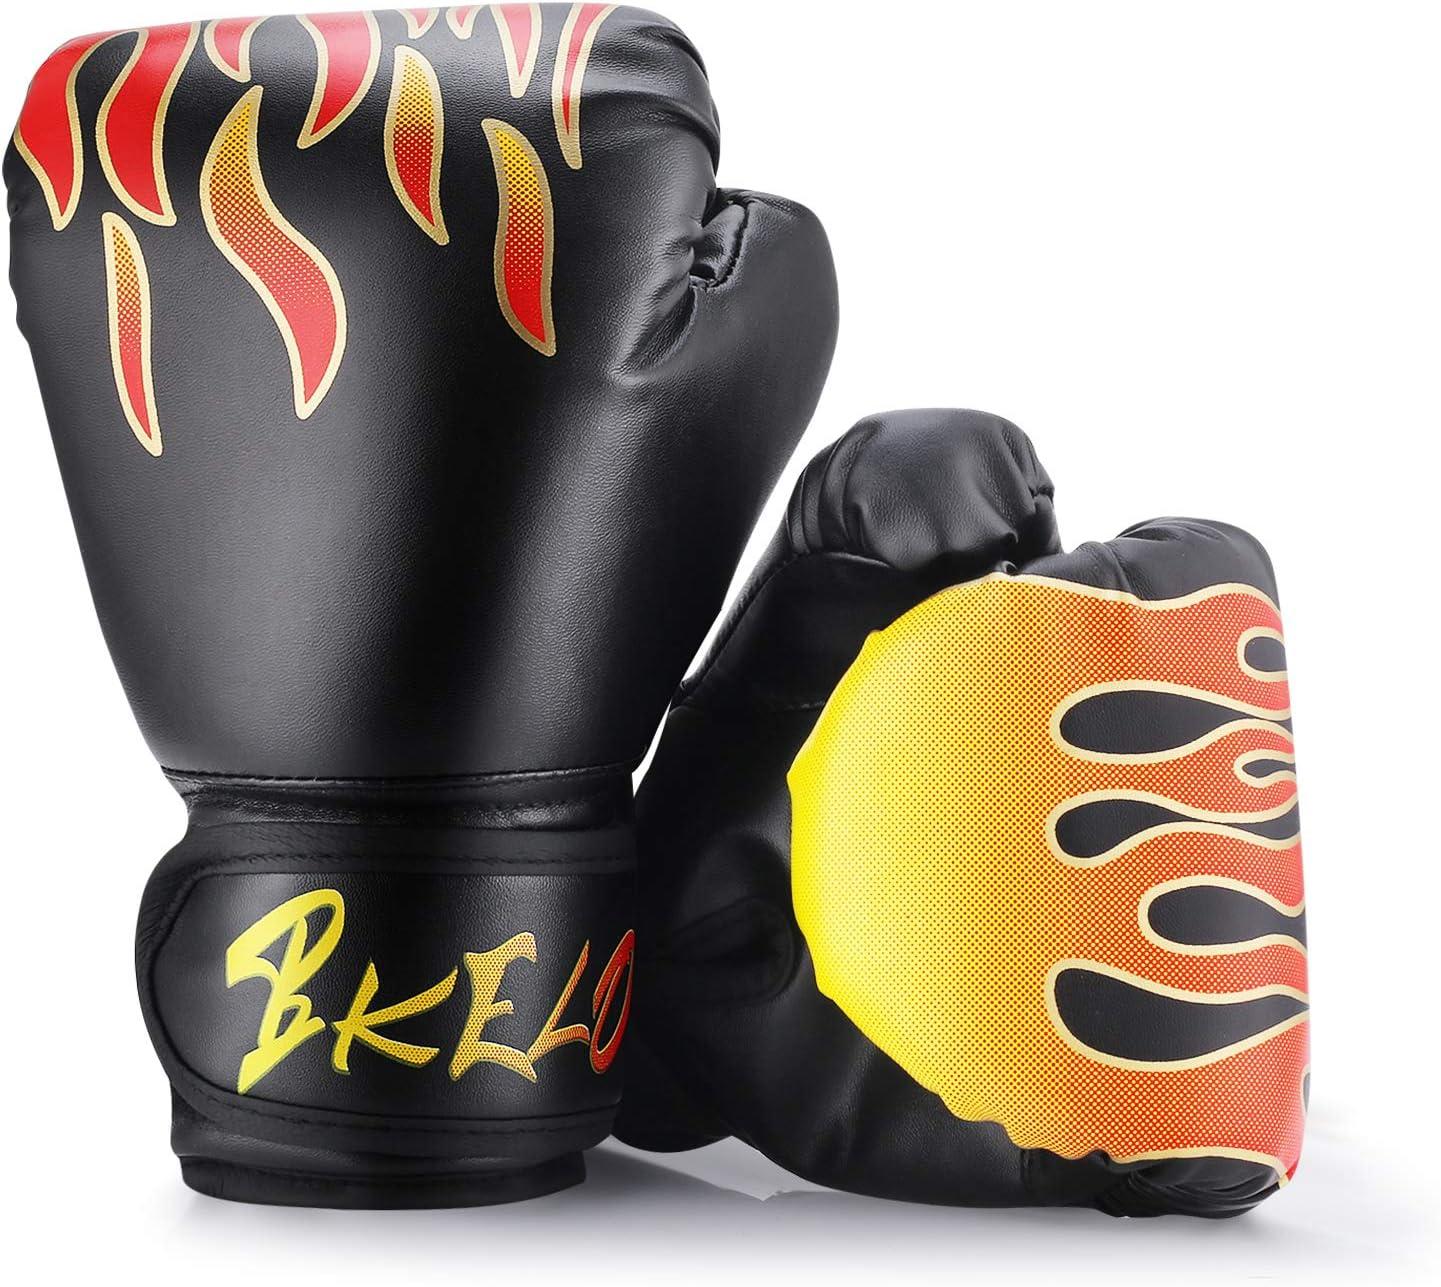 Haepe Children Cartoon Boxing Gloves Kickboxing Punching Bag Training Fight,Training Punch Bag Sparring Gloves Mitts Punching Bag Muay Thai Gloves